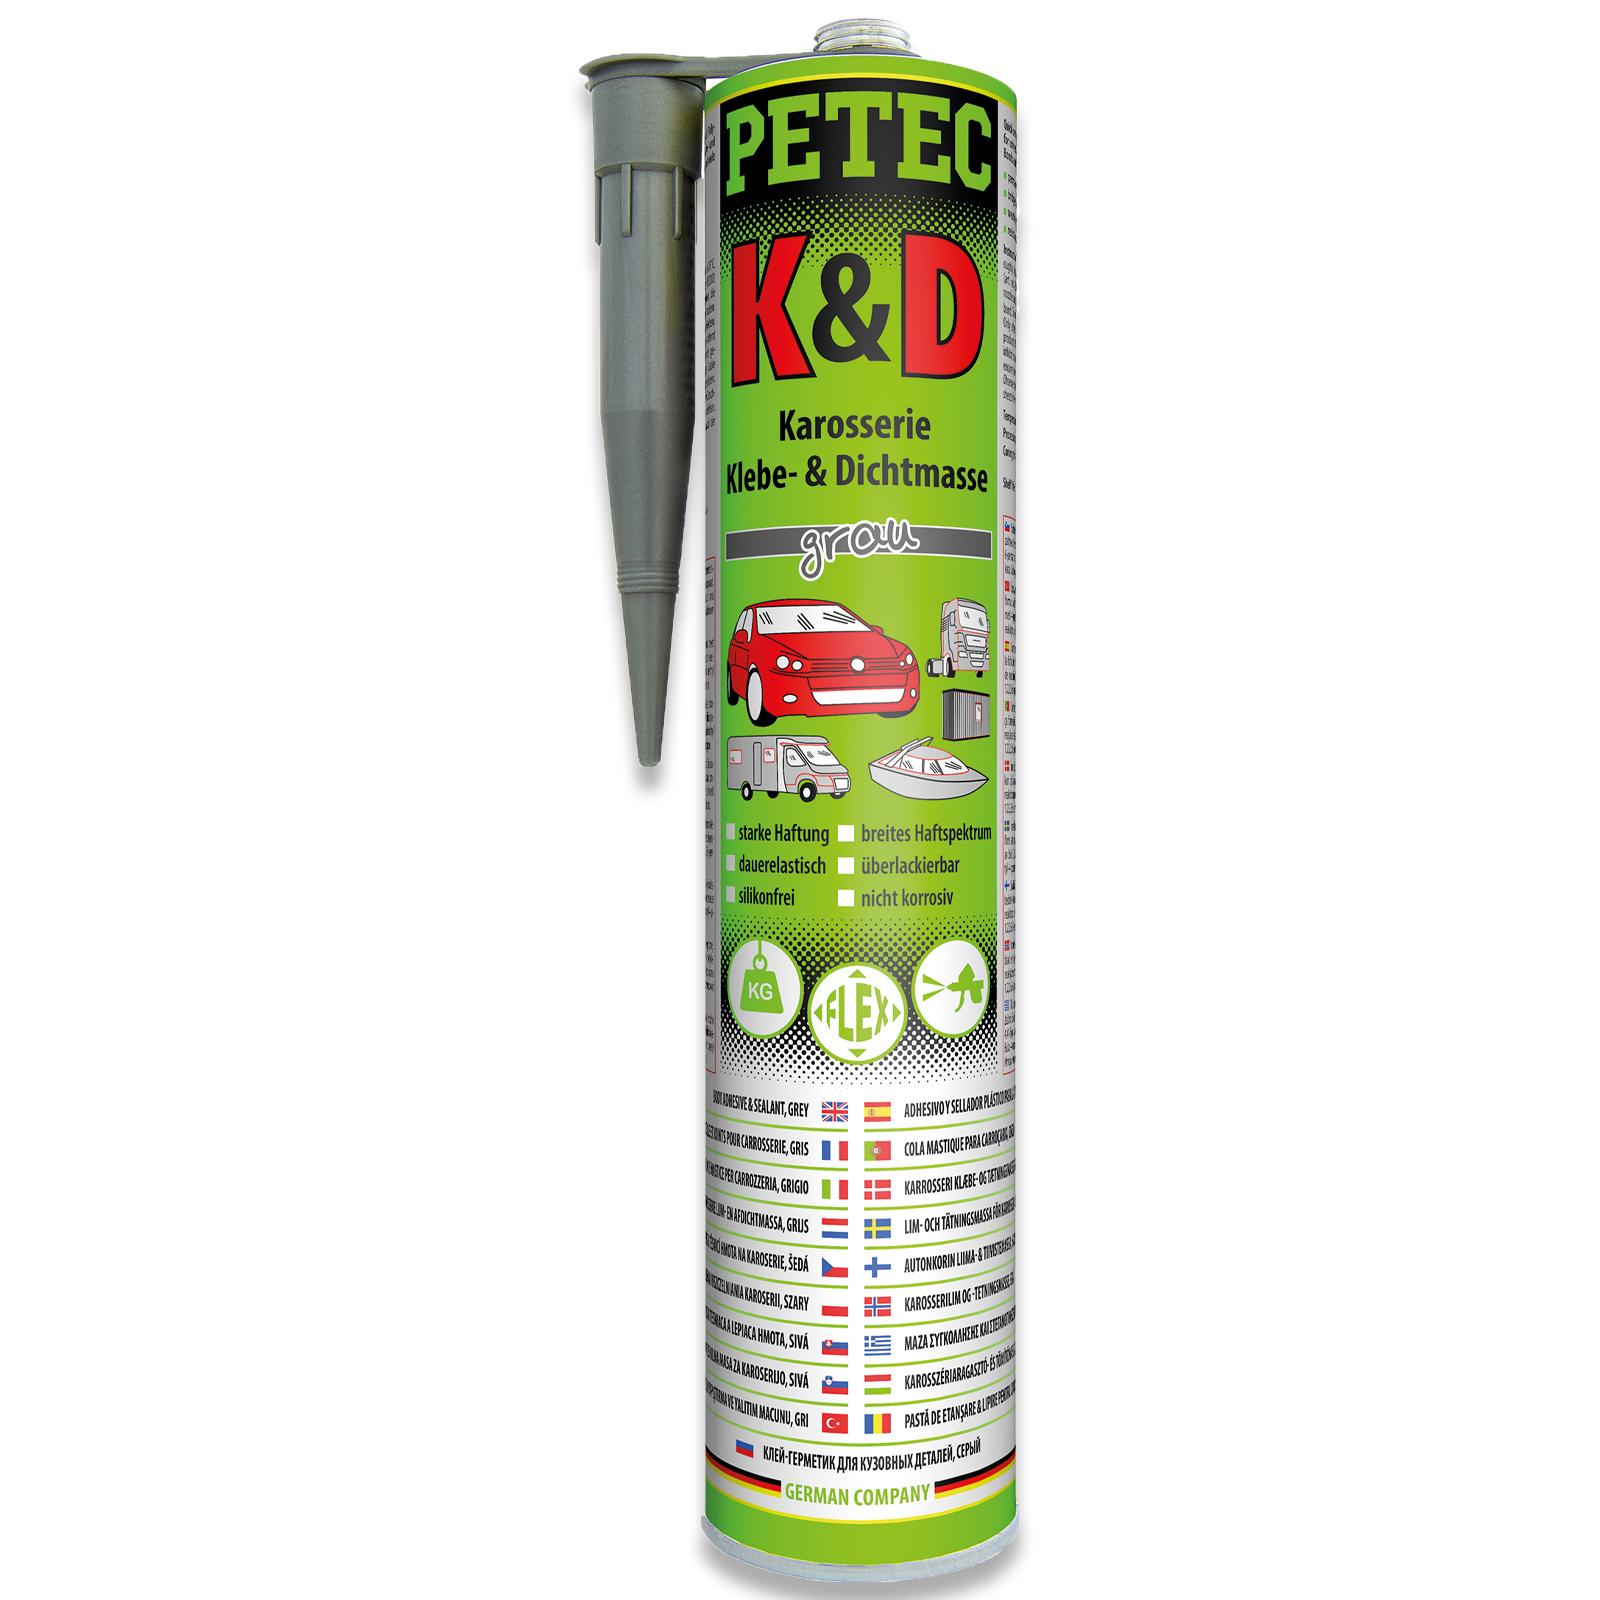 PETEC K & D Karosserie Klebe- und Dichtmasse grau 310ml